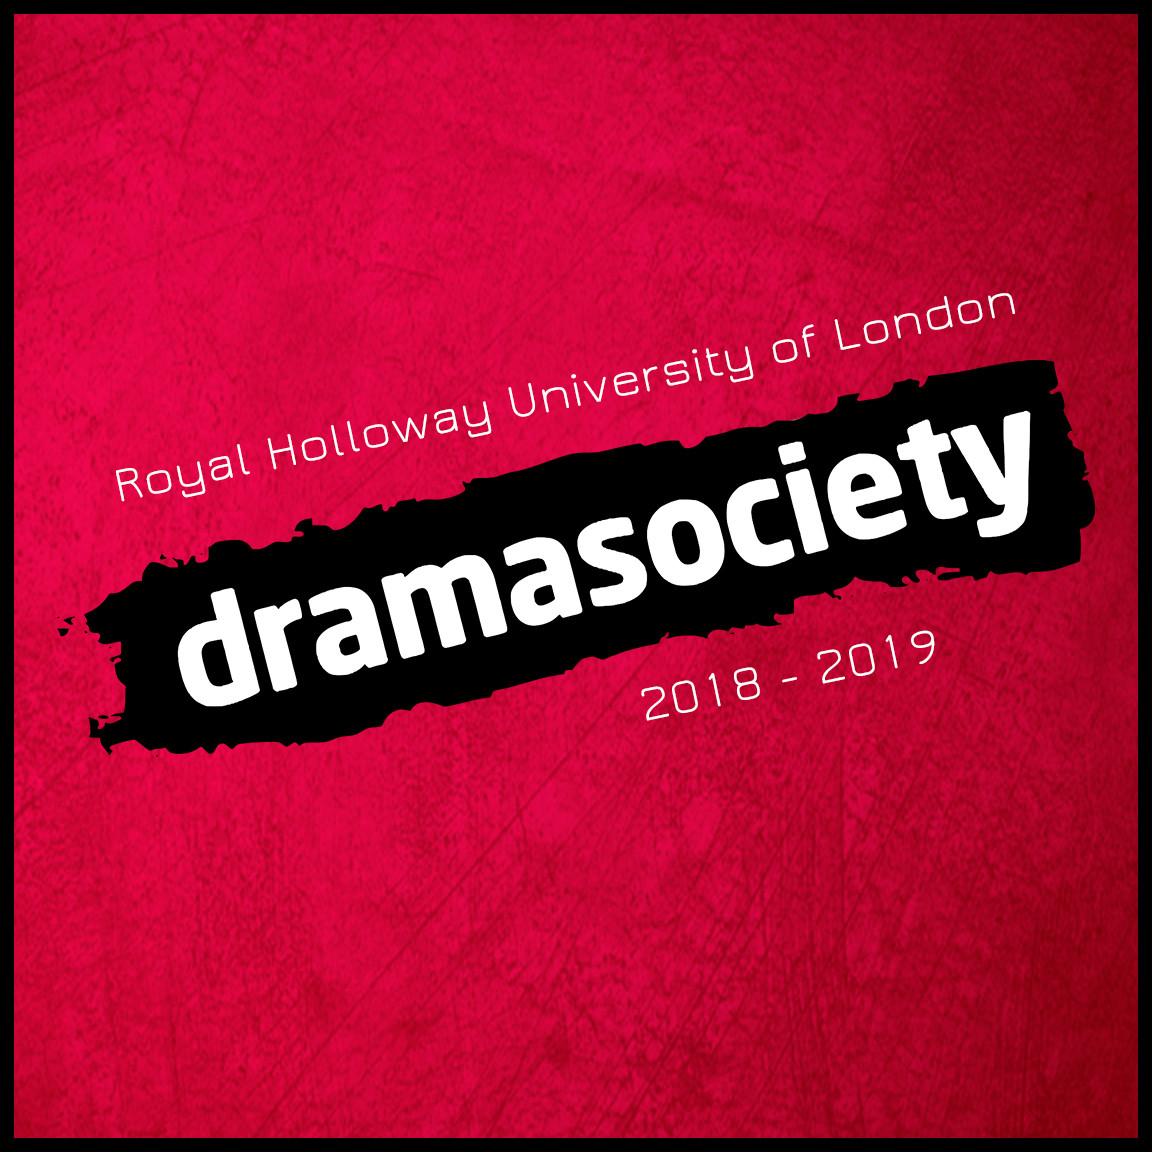 RHUL Drama Society